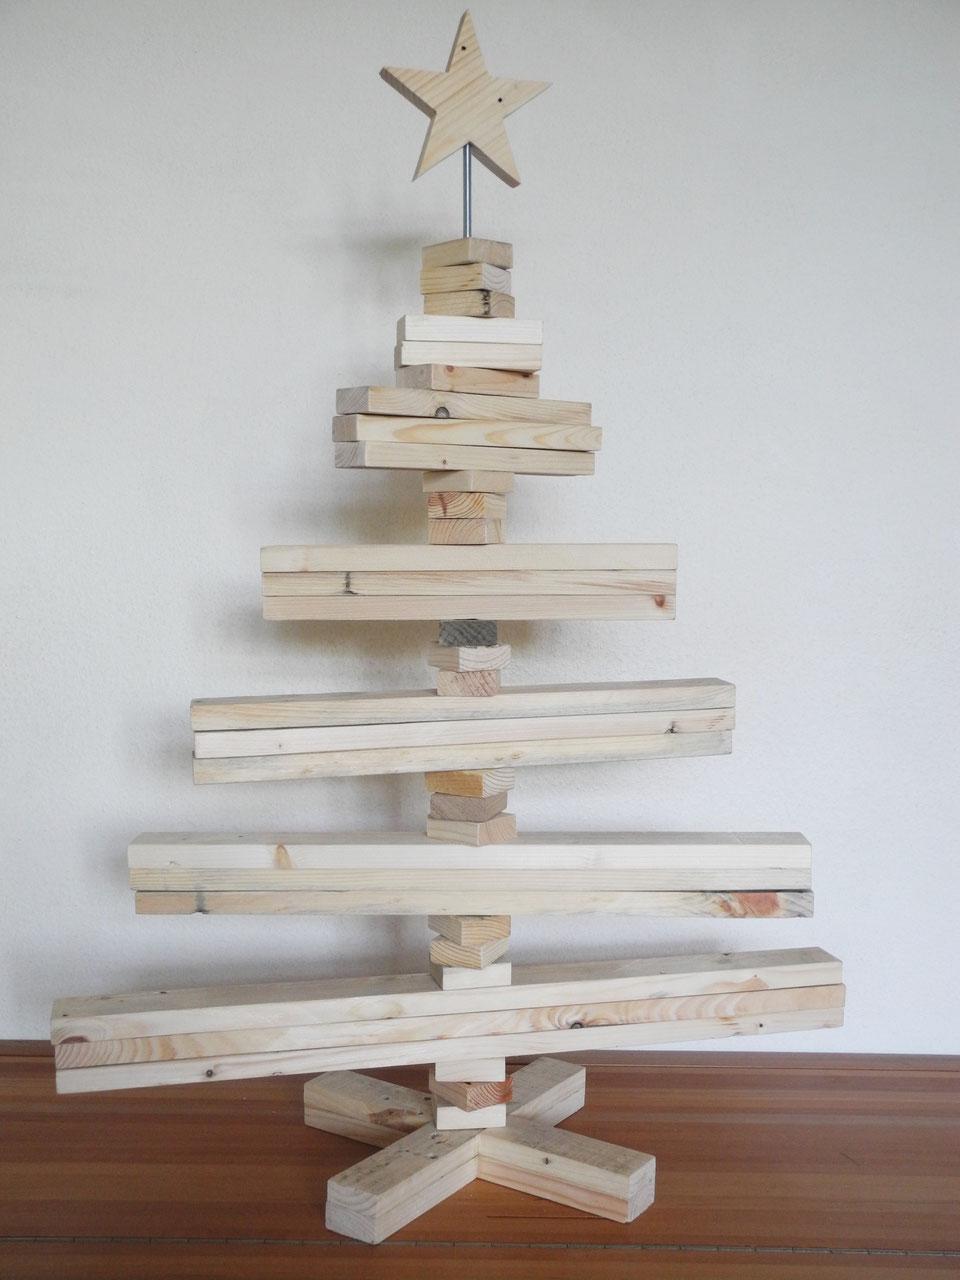 weihnachtsb ume palettenholz palettenm bel treibholz wohnaccessoires. Black Bedroom Furniture Sets. Home Design Ideas